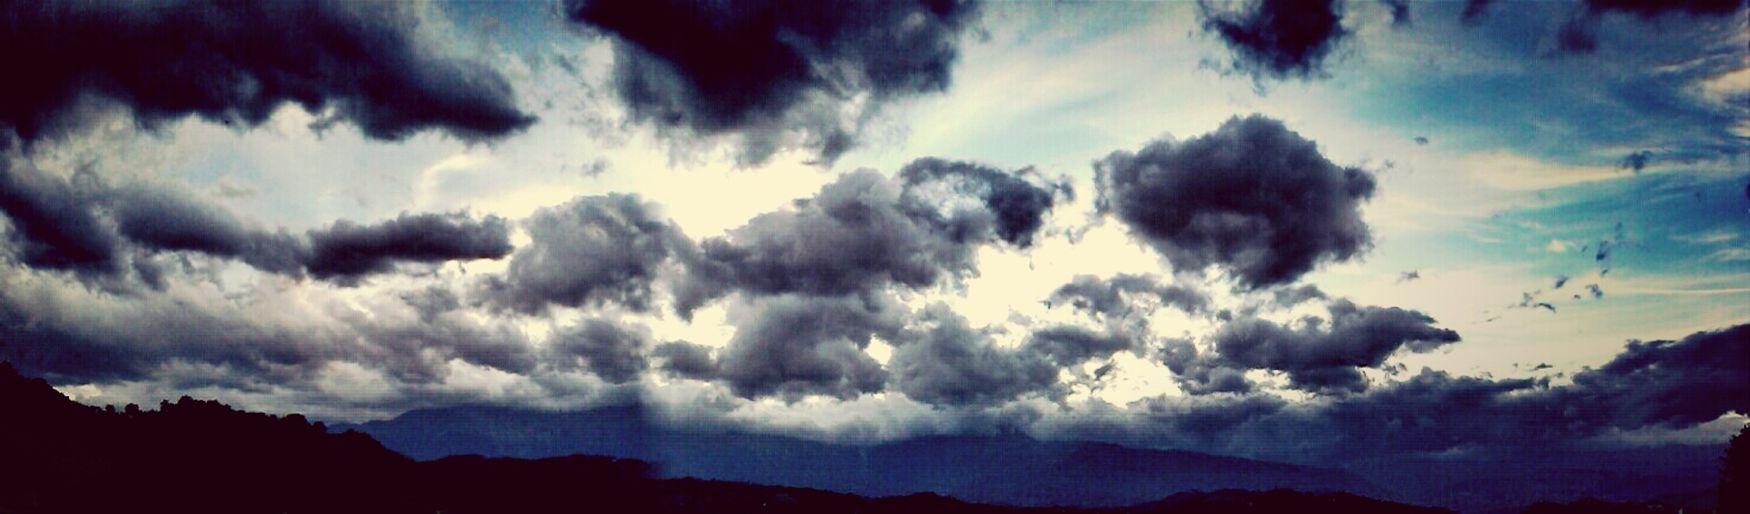 Sky&Clouds Clouds Sky Clouds And Sky